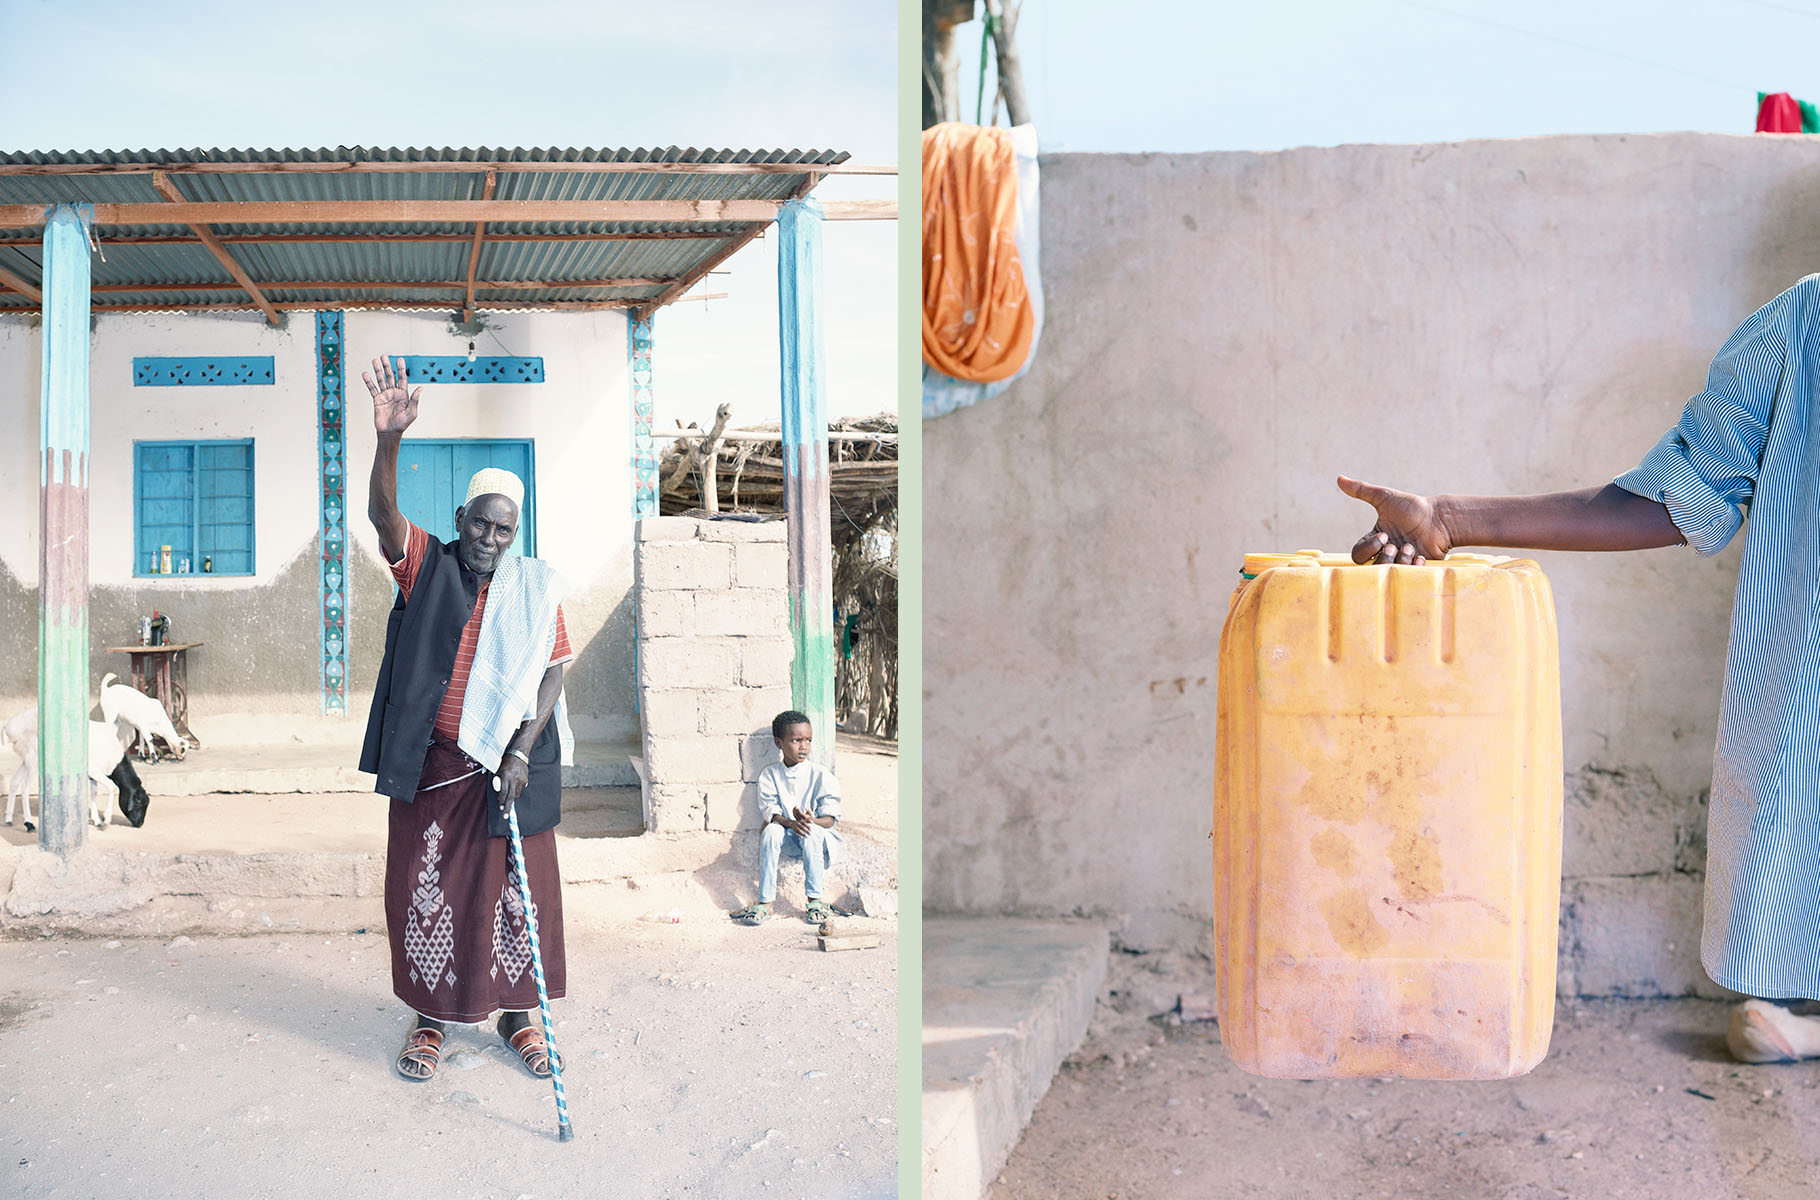 Dip 9 Hassan Haji Tawakal (80 years old) with Nasri Mustafe Girde (6 years old) sat on the step, Gargarra, Somaliland copy_with green